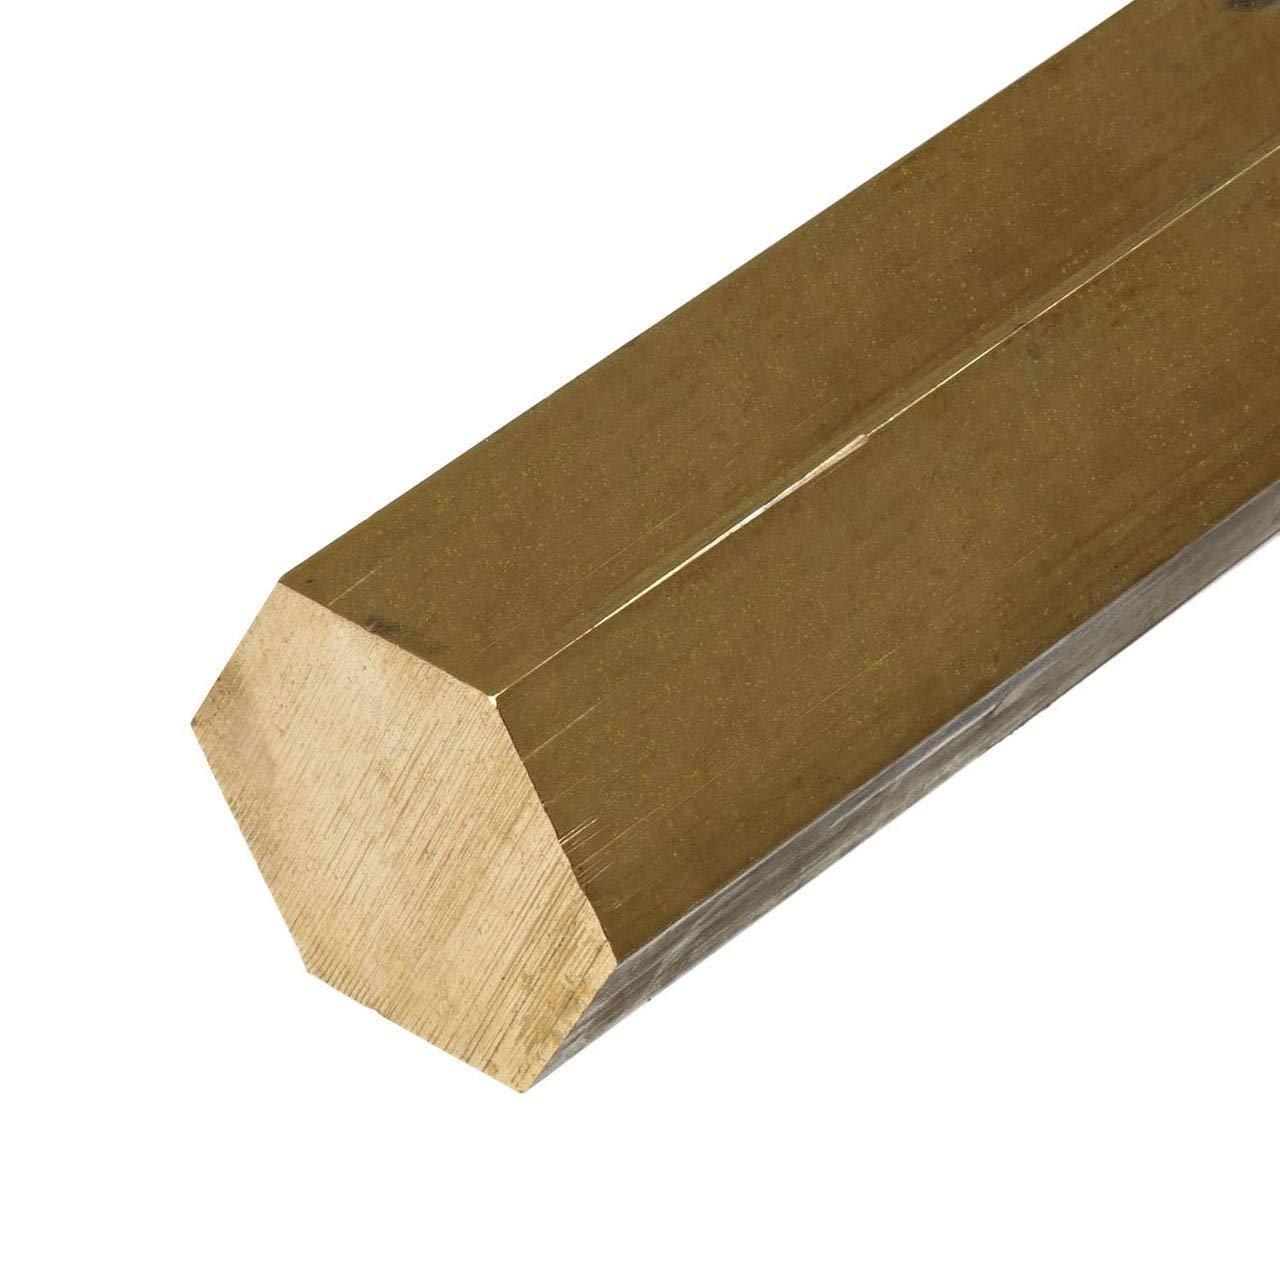 Online Metal Supply Be super welcome Max 55% OFF C360 Brass Hexagon Bar 0.375 inch x 3 1 8